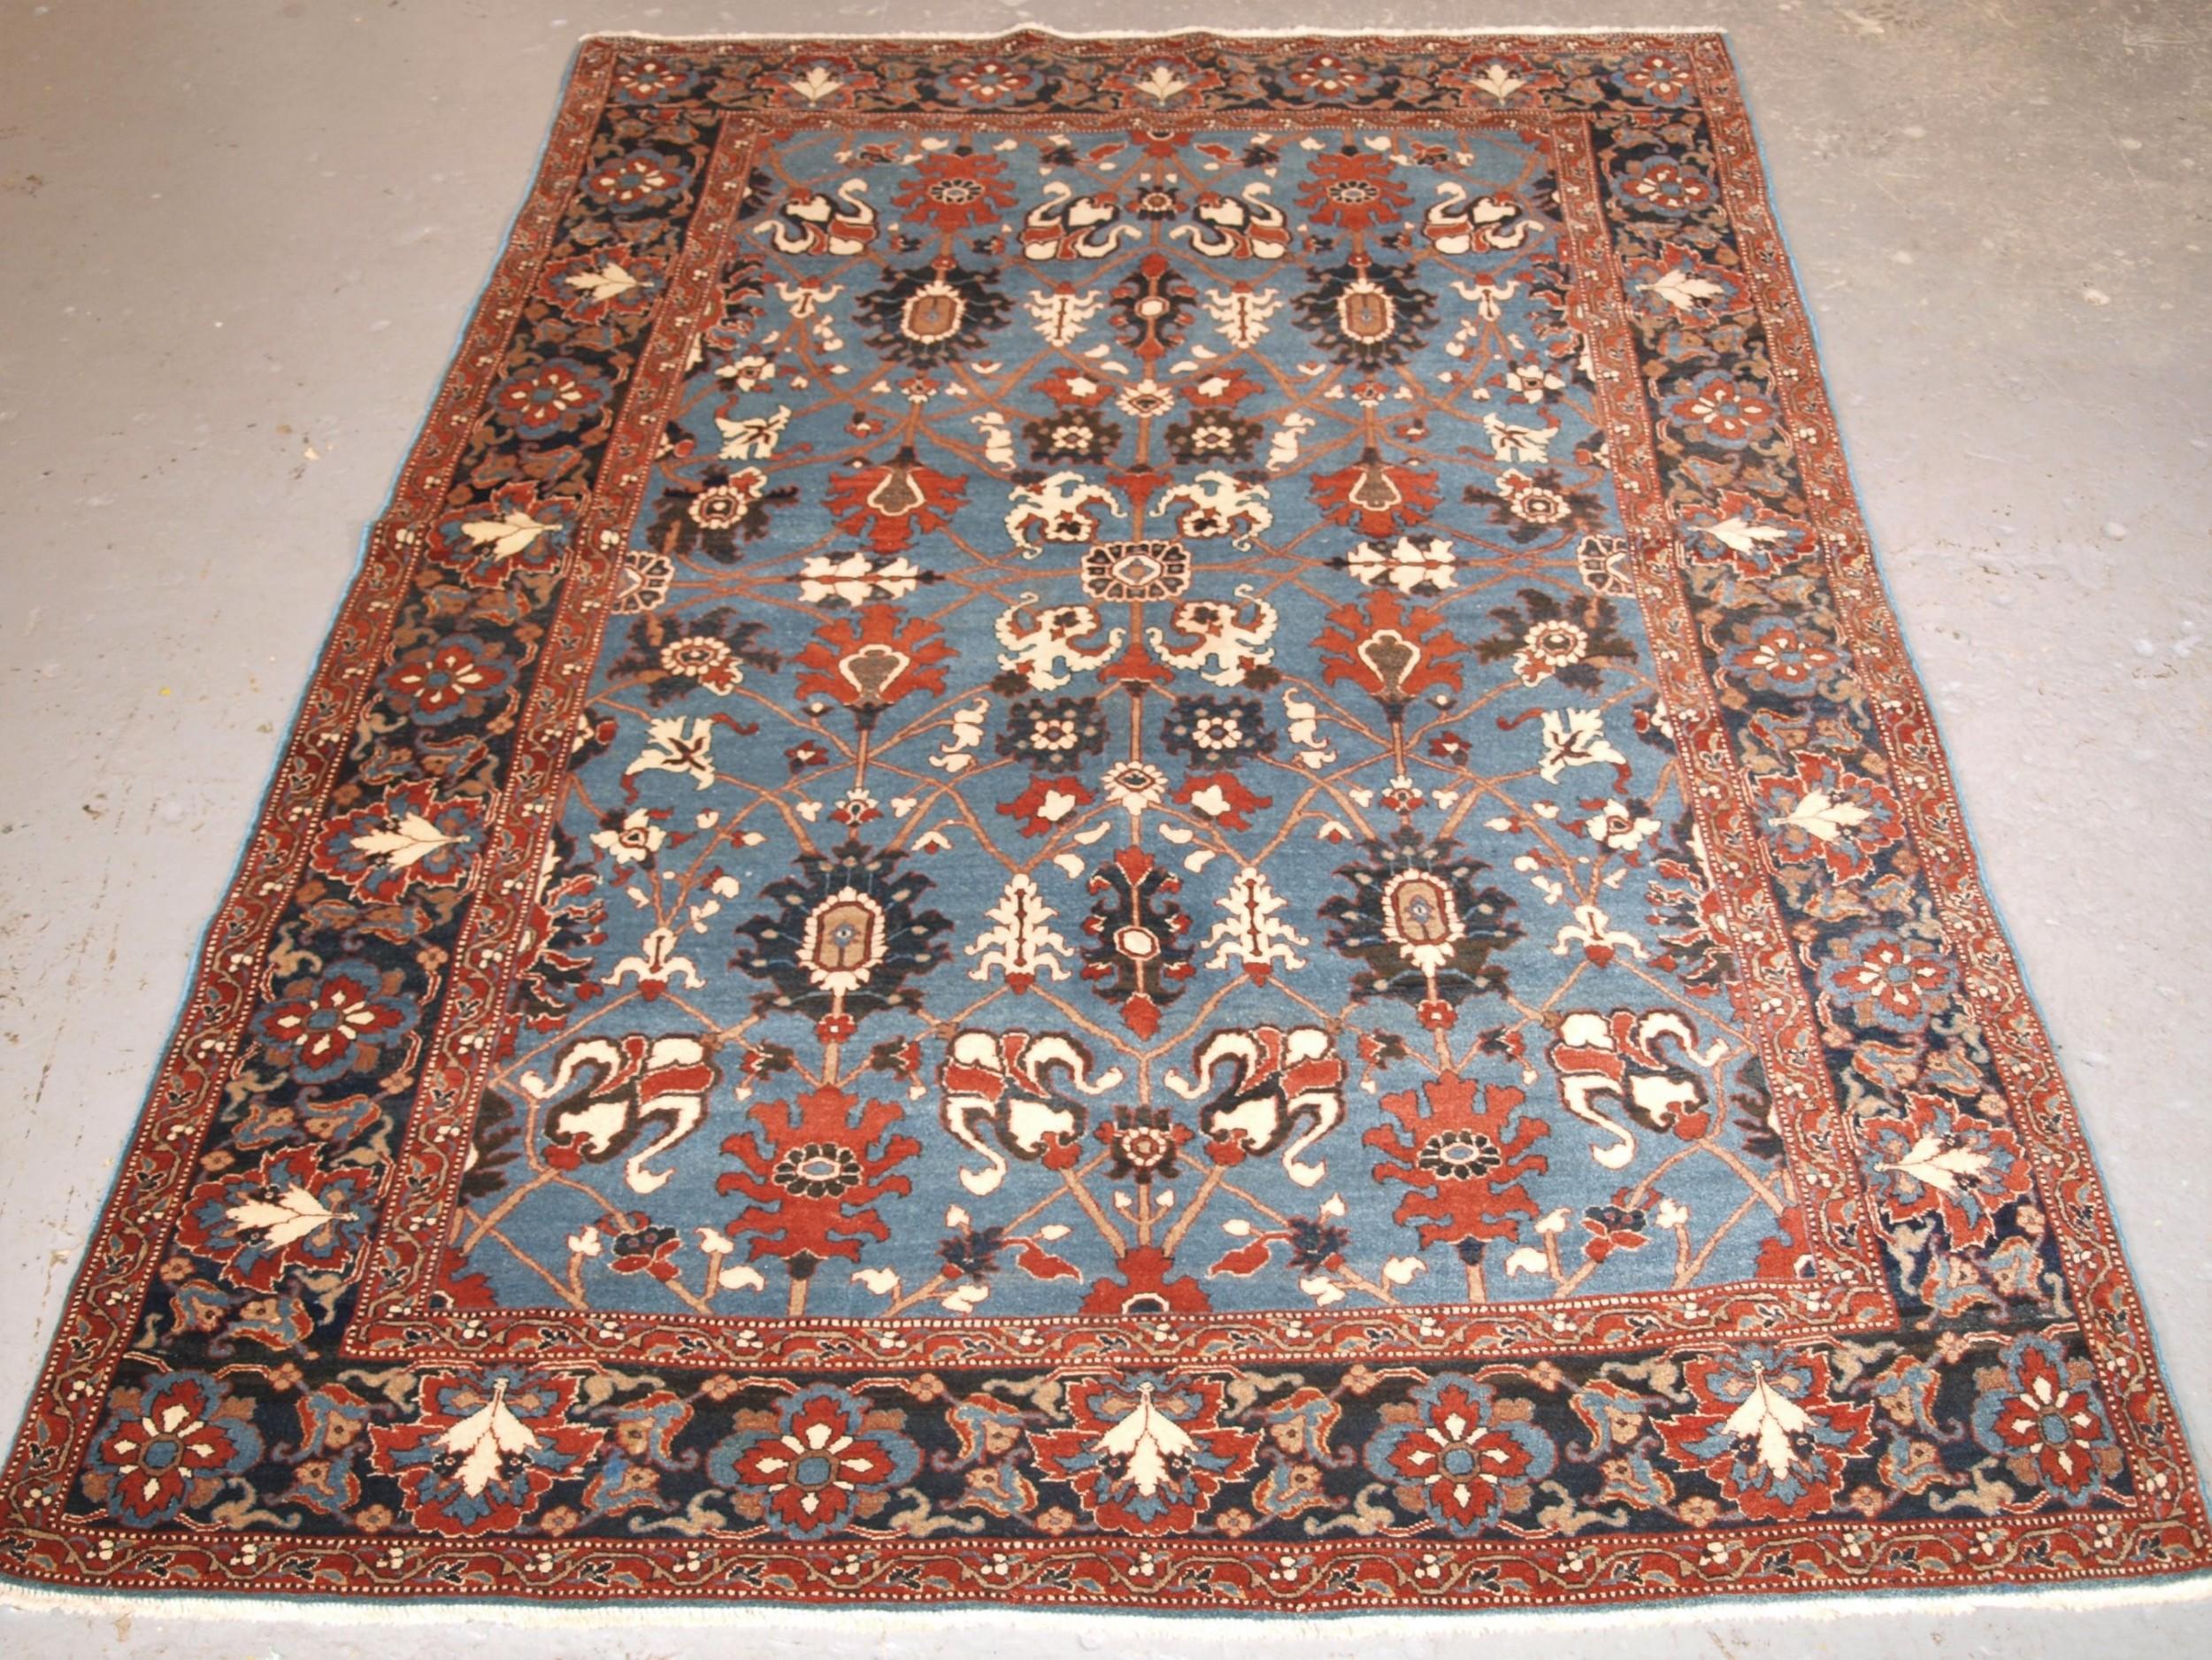 antique tabriz rug with safavid inspired vase design circa 1920